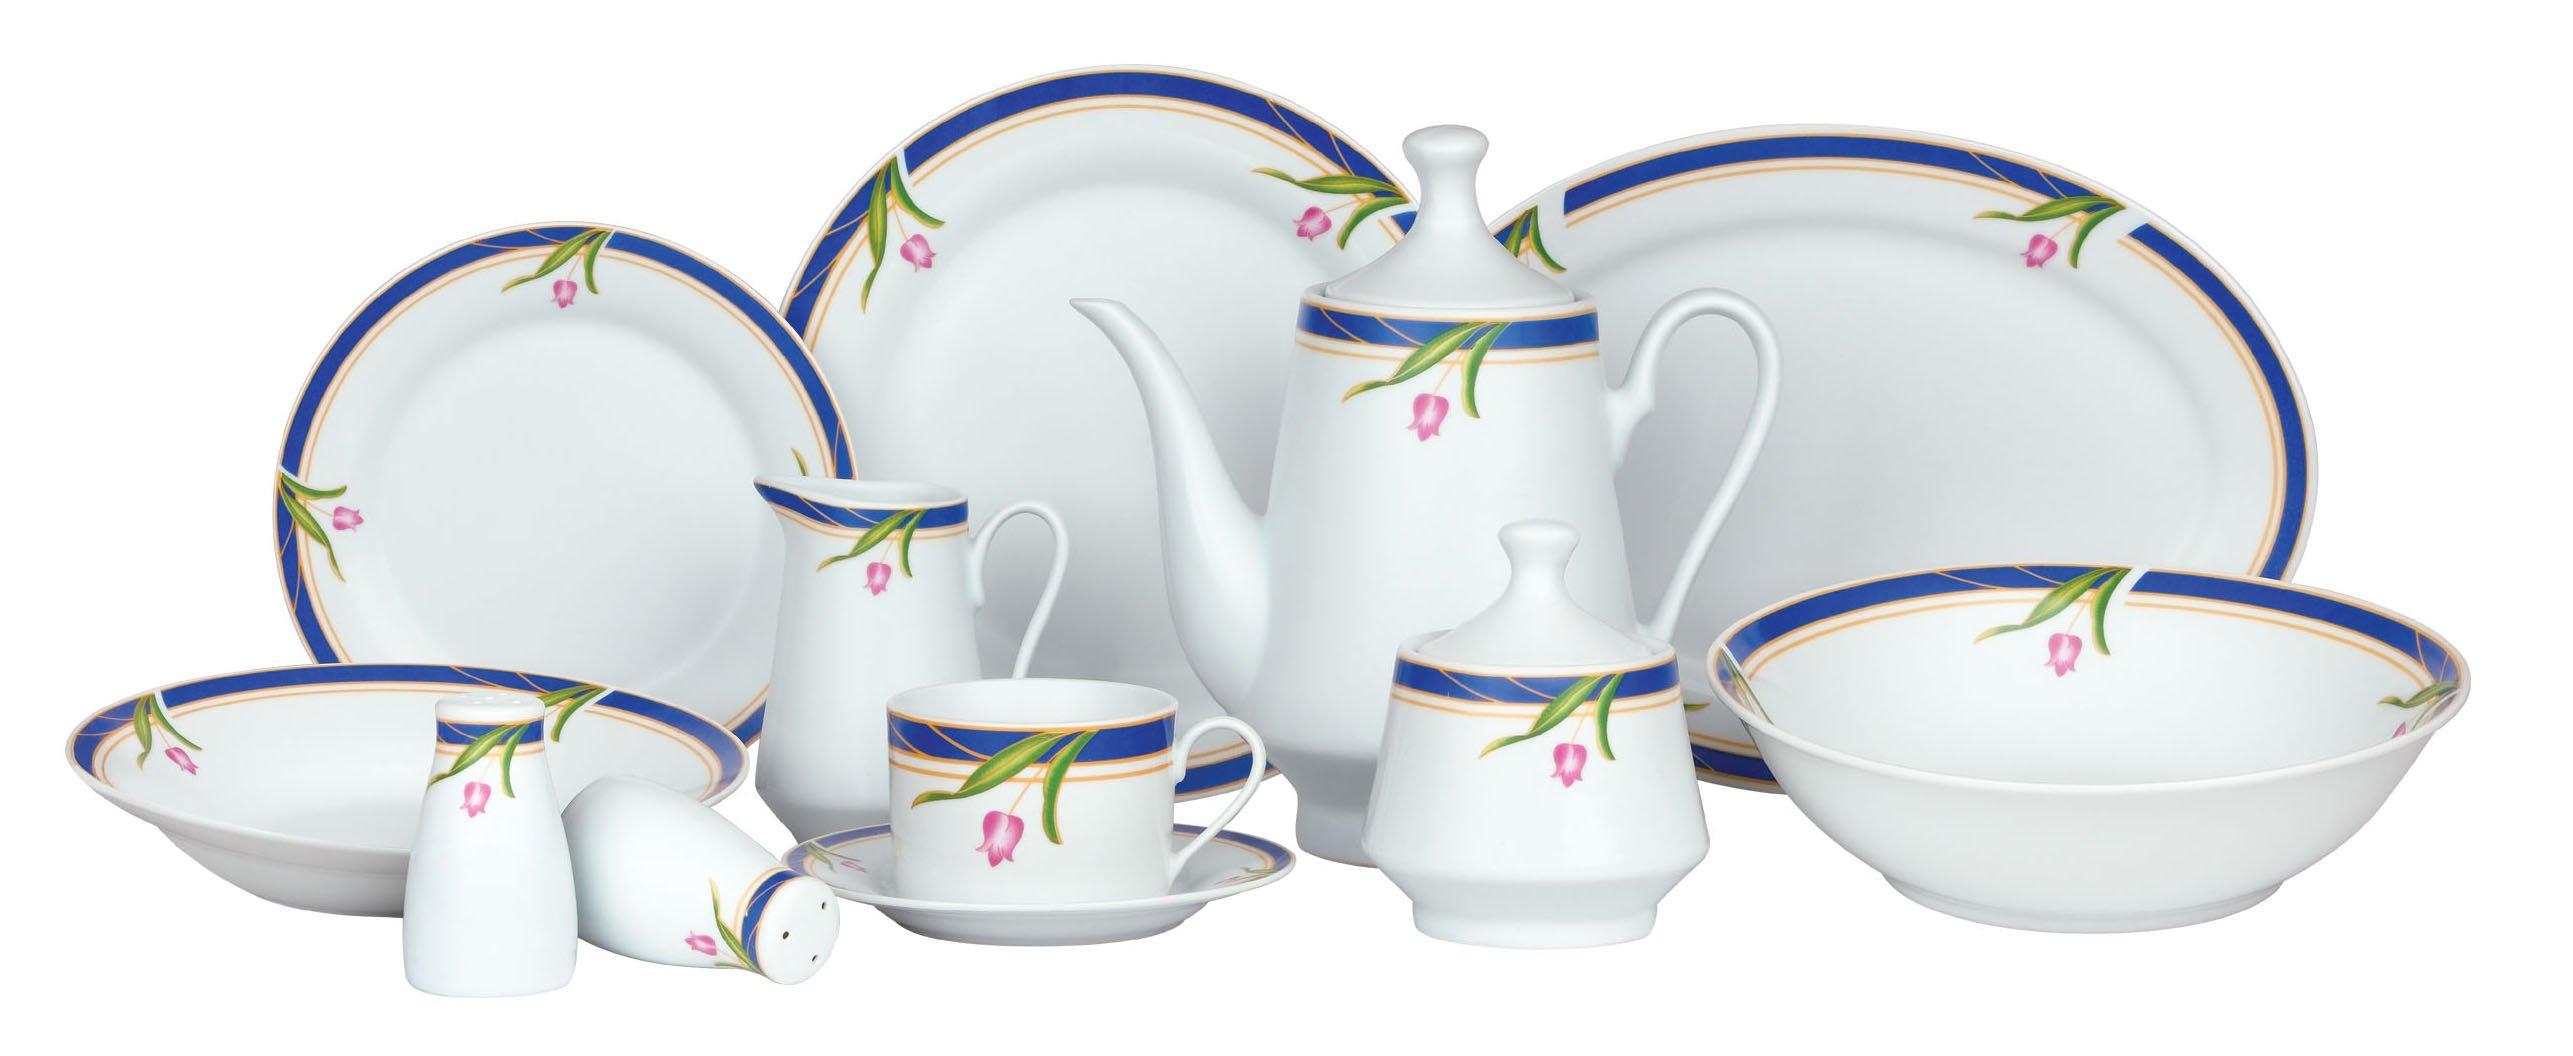 47pcs porcelain round dinnerware set crockery set buy for Place setting images